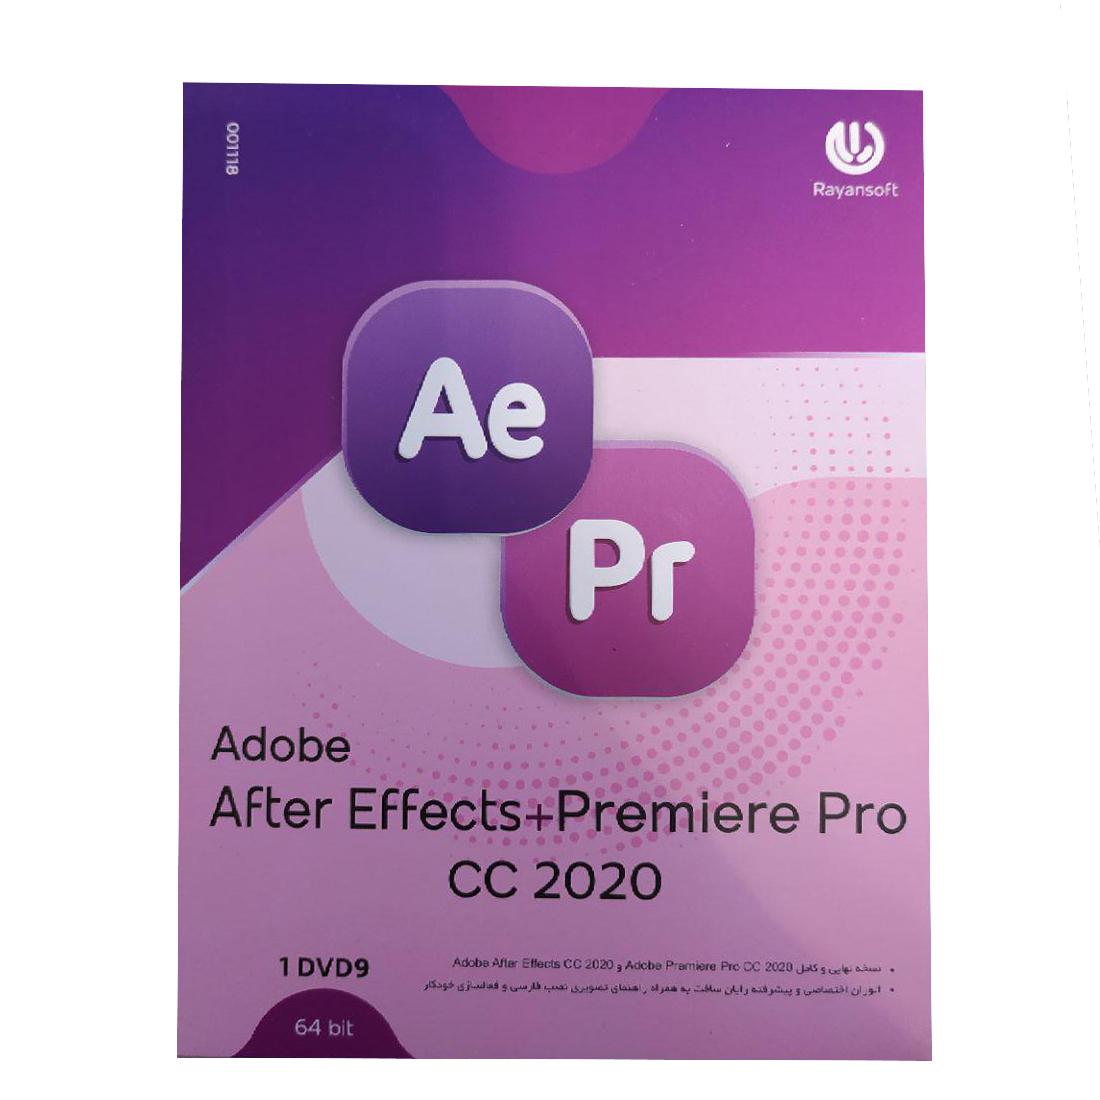 مجموعه نرم افزار Adobe After Effects+PremierePro CC2020 نشر رایان سافت